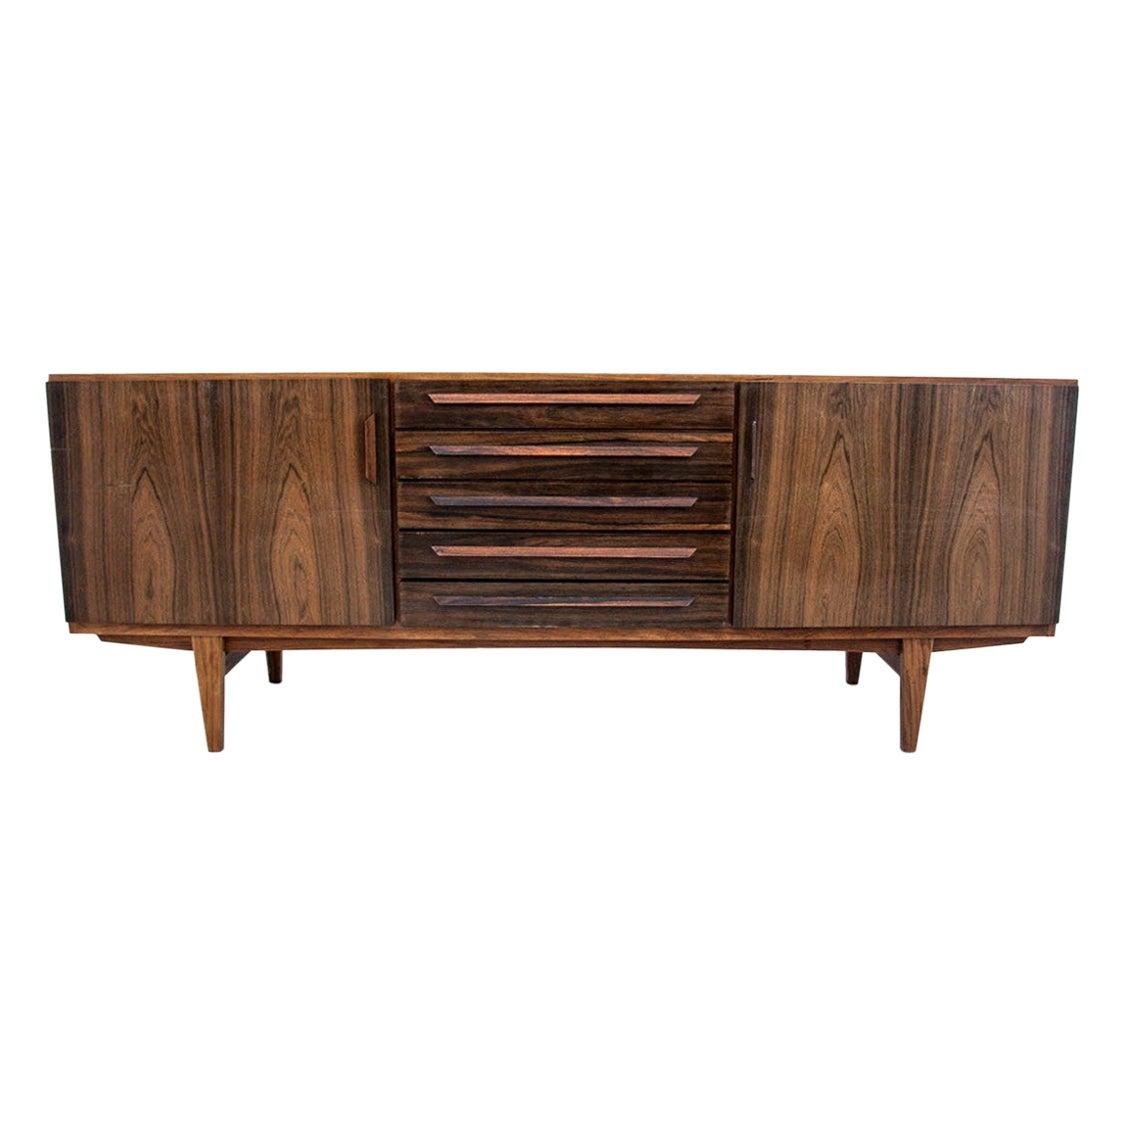 Rosewood Sideboard, 1960s Denmark